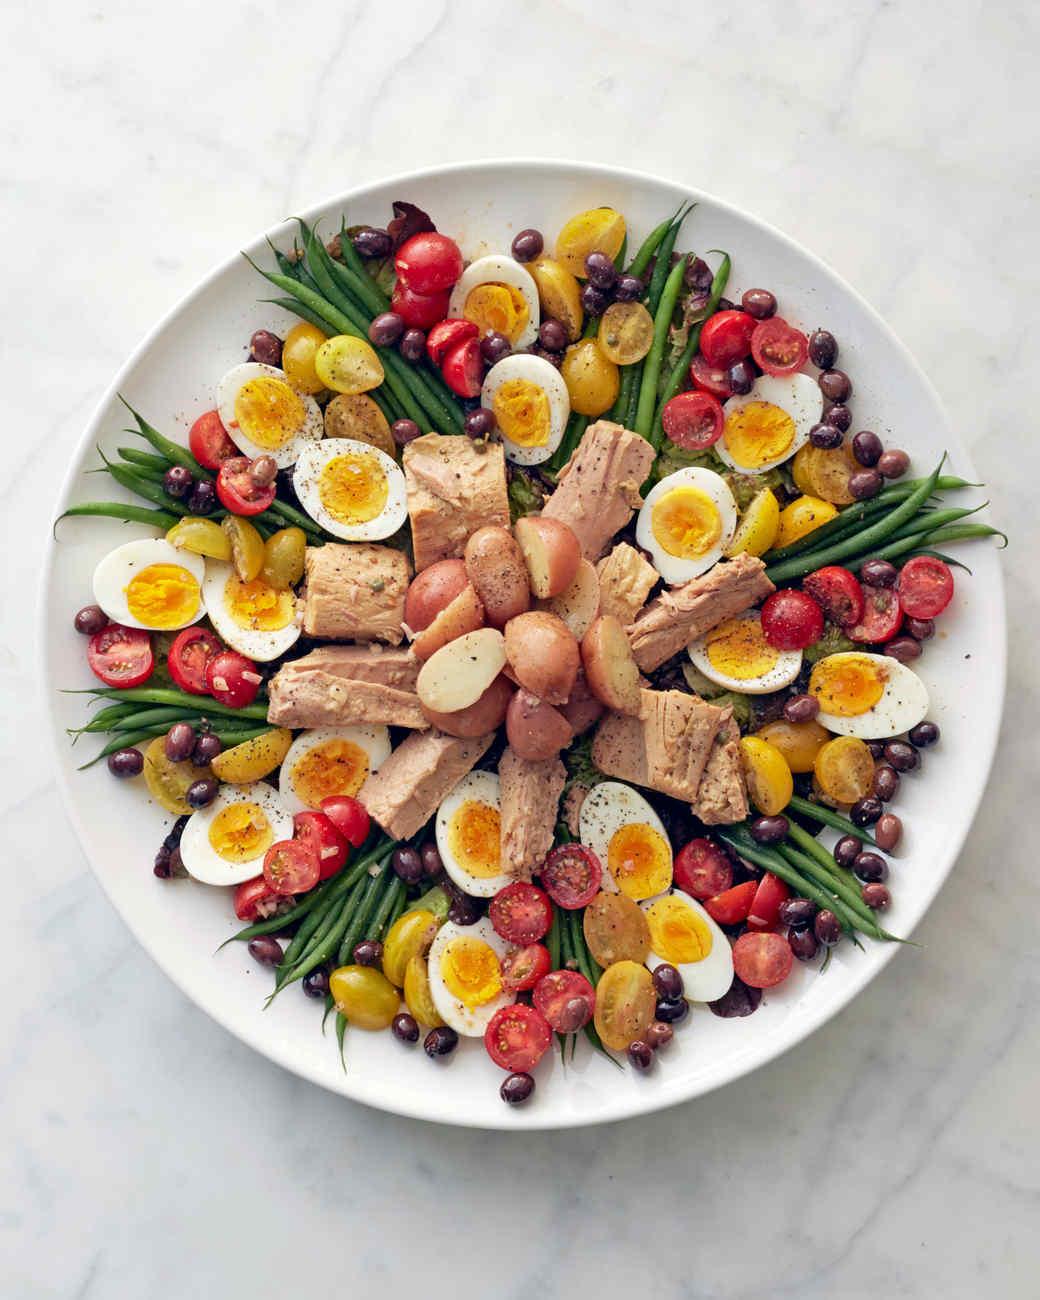 nicoise-salad-151-d111289_vert.jpg?itok=pB2optUG